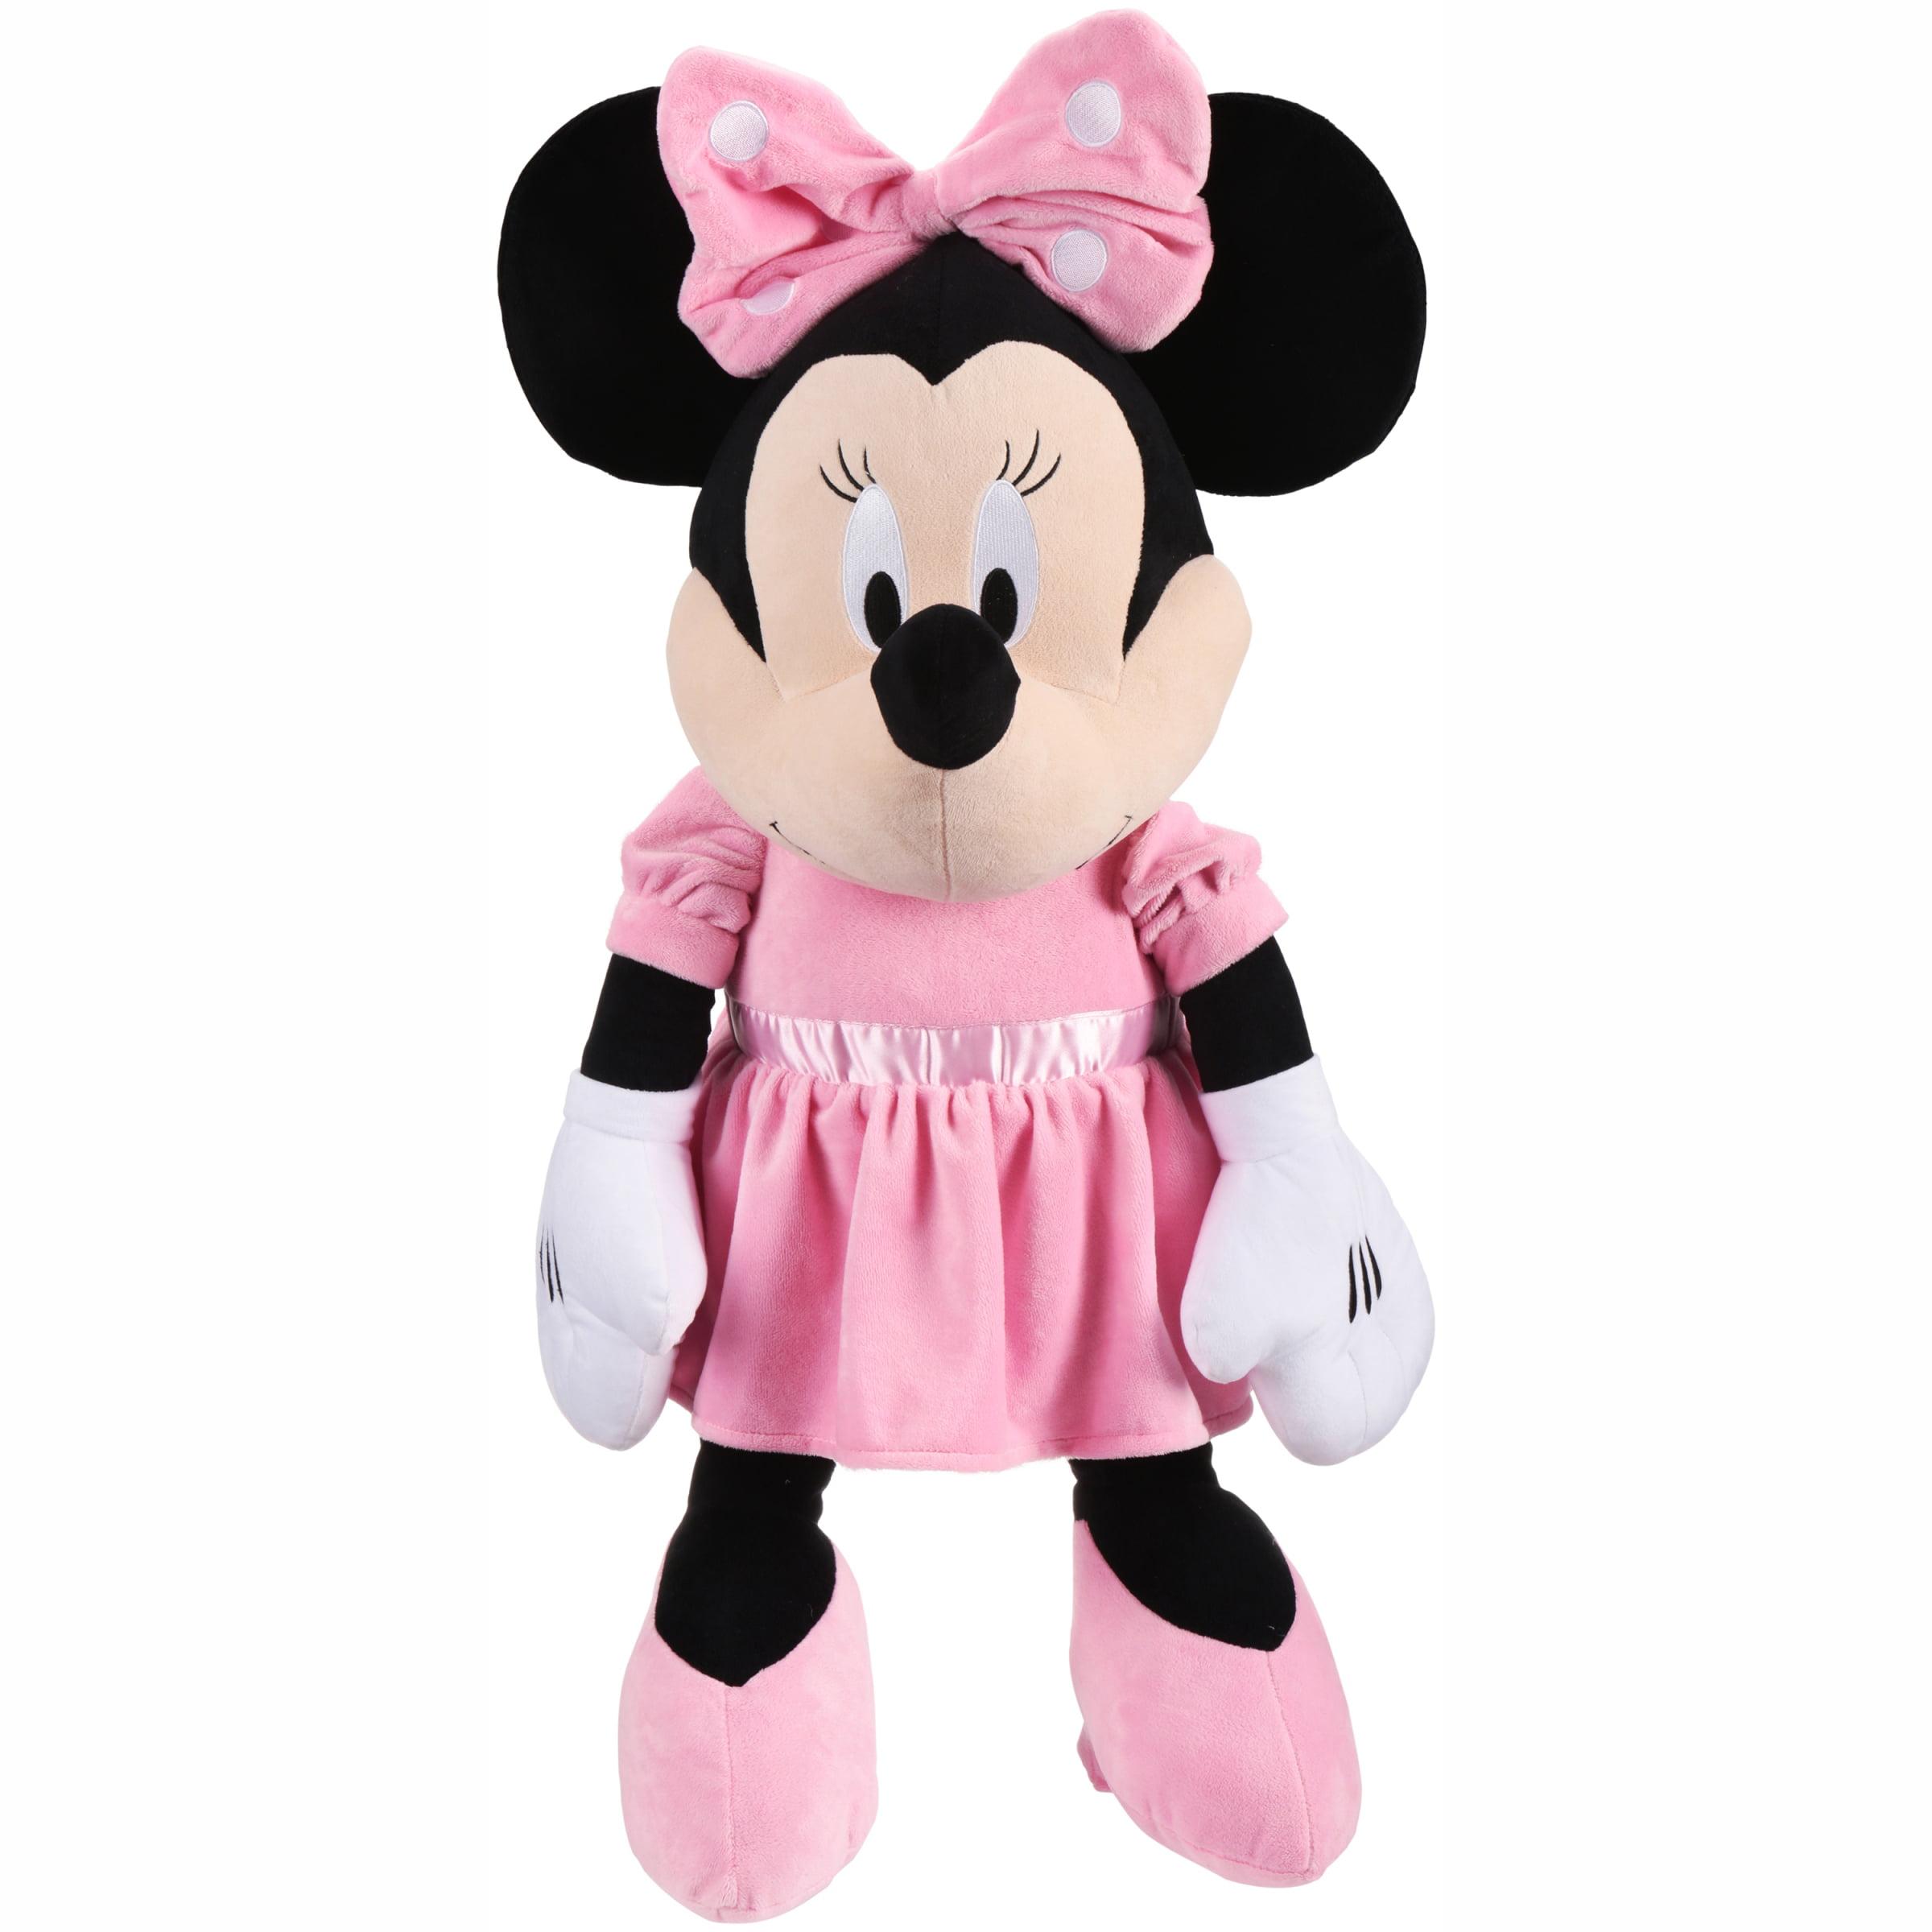 Disney Baby Minnie Mouse Doll by Kids Preferred, LLC